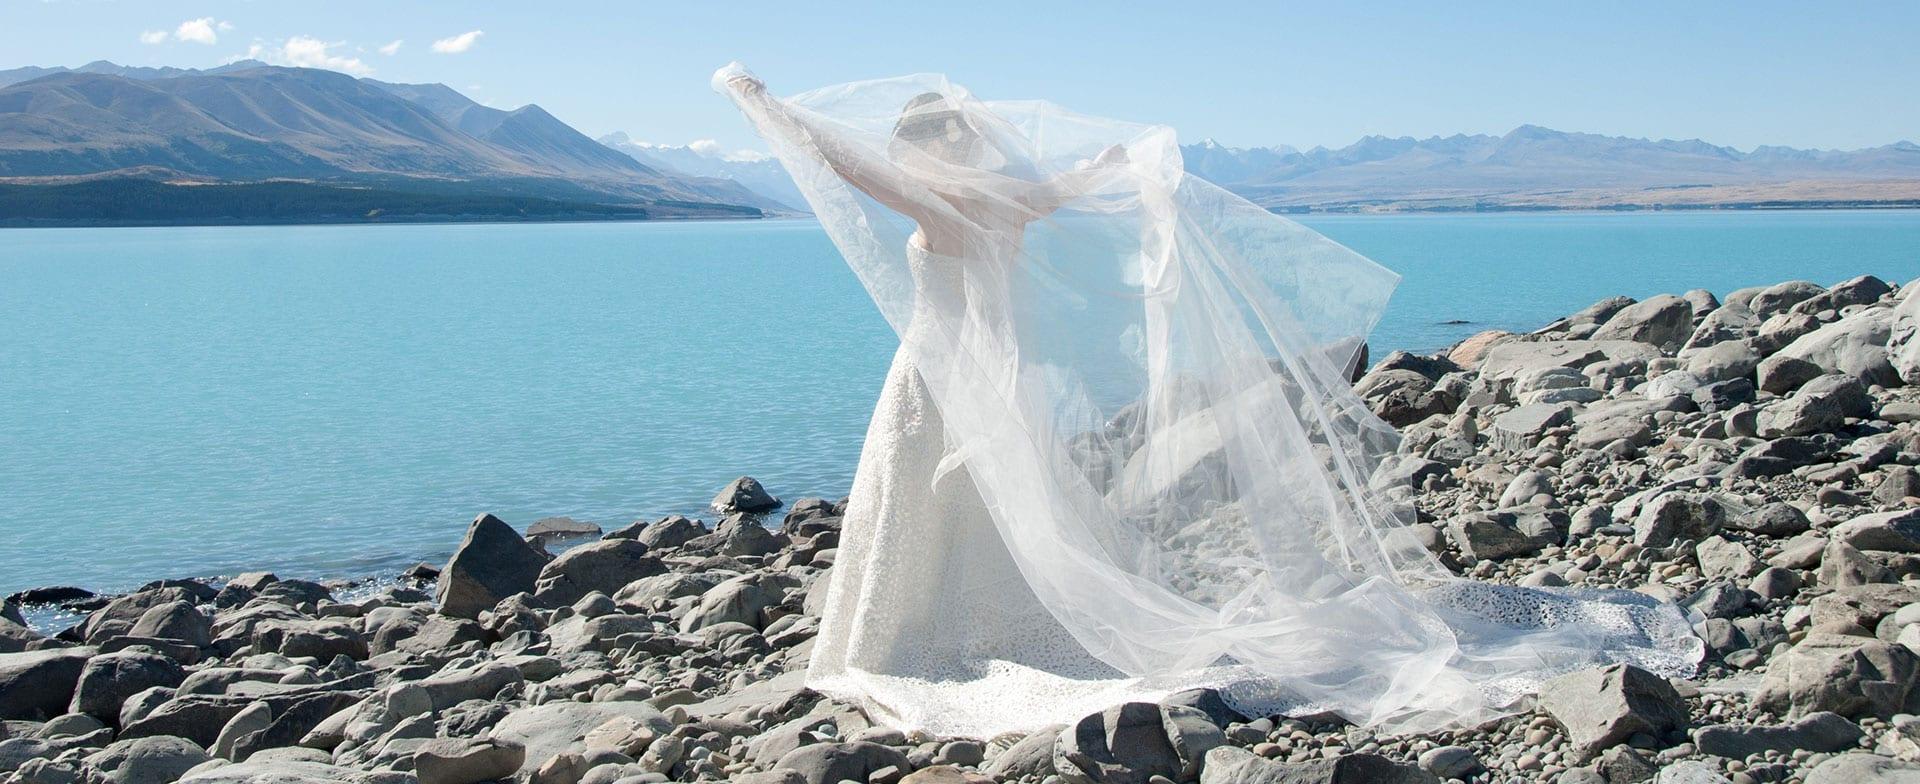 Church and Chapel Weddings | New Zealand Dream Weddings